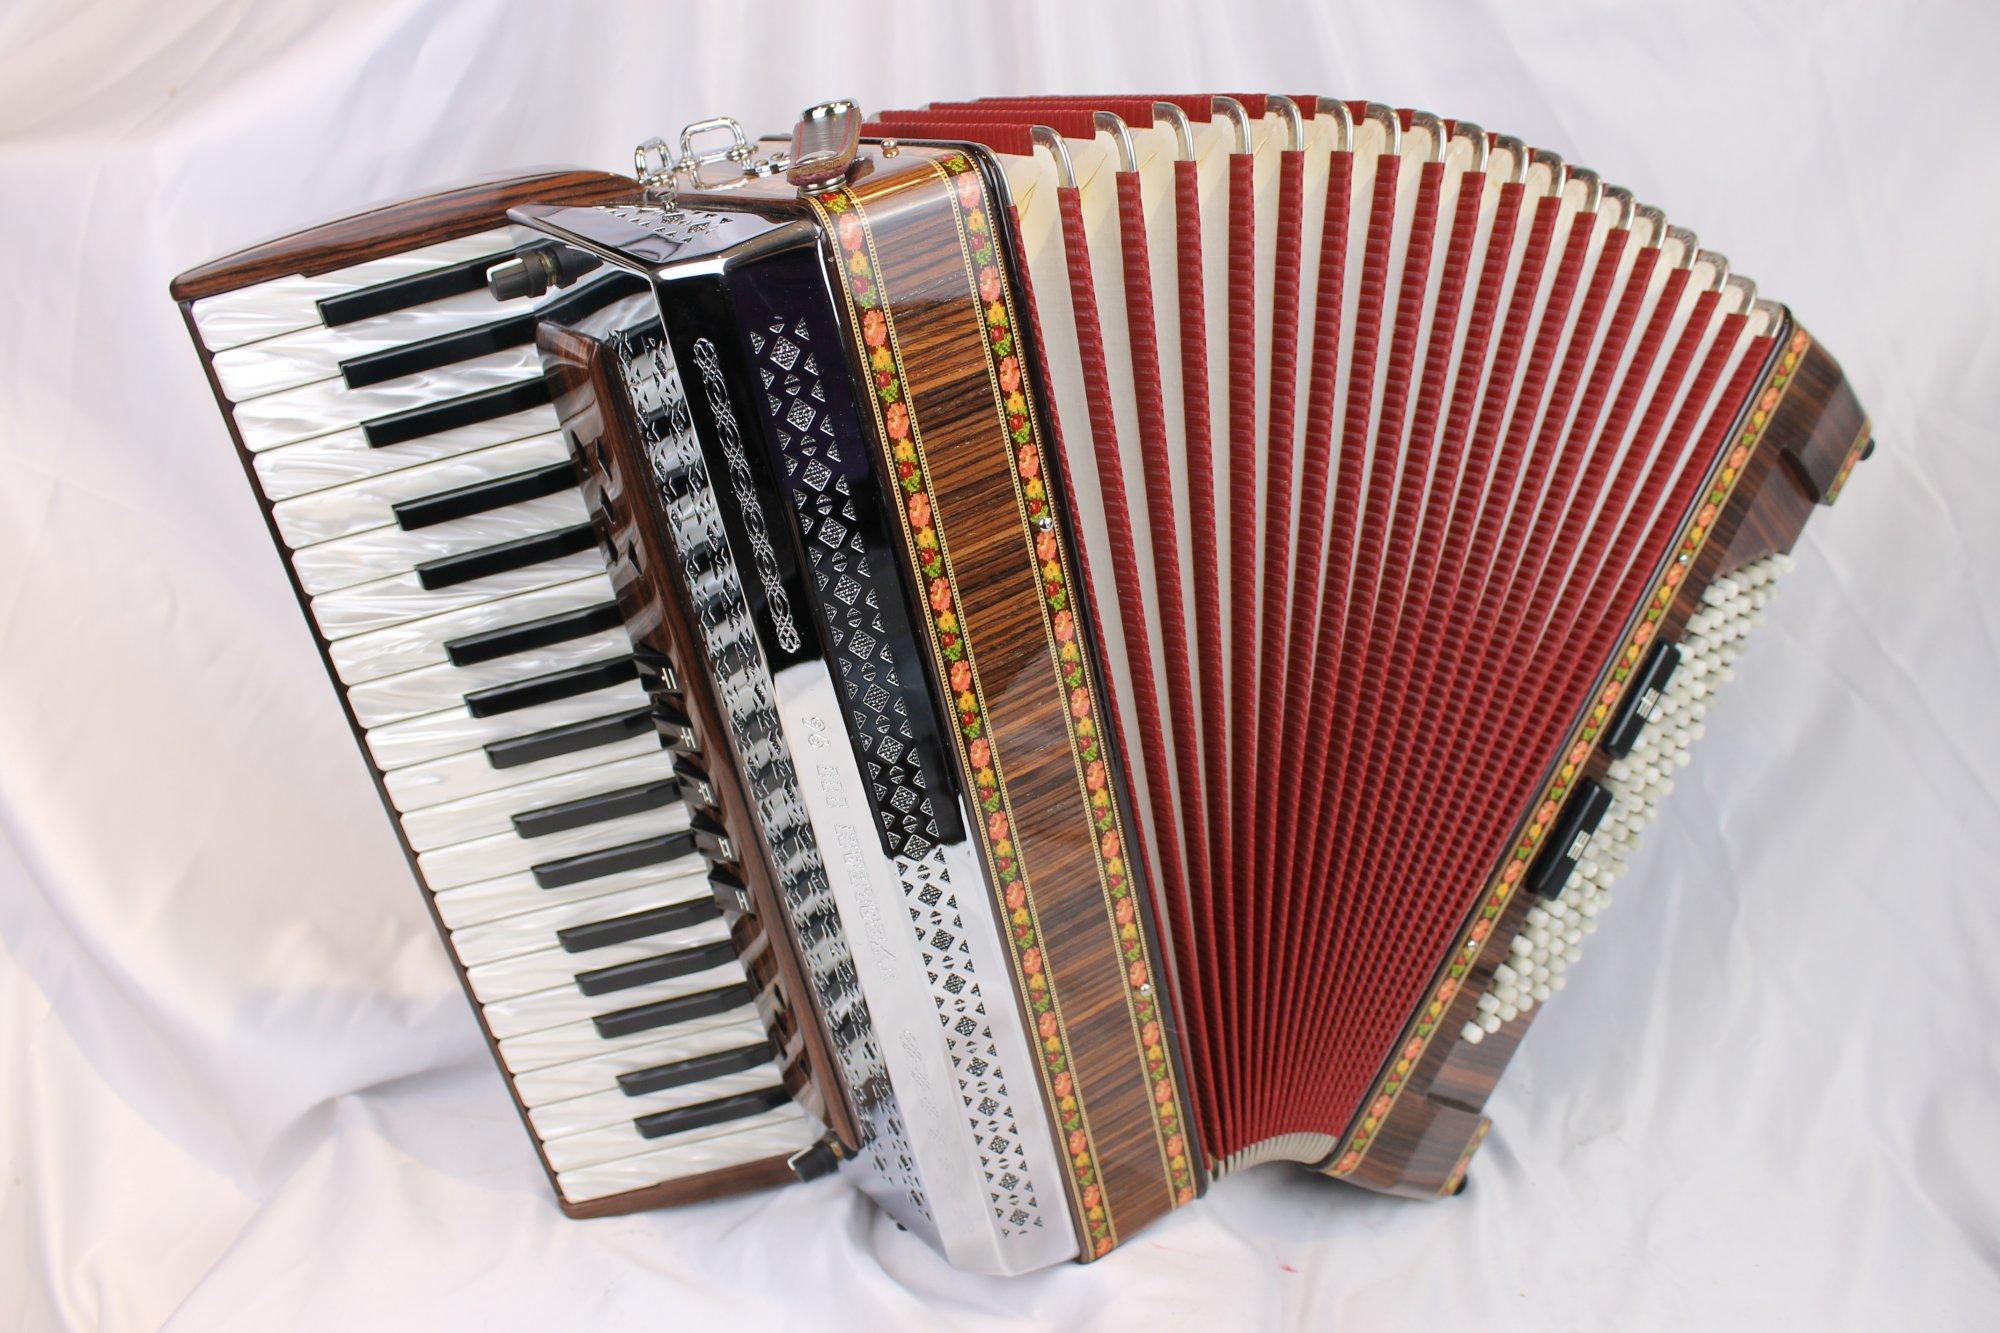 5012 - Like New Rosewood Beltuna Tyrolean III Piano Accordion LMM 37 96